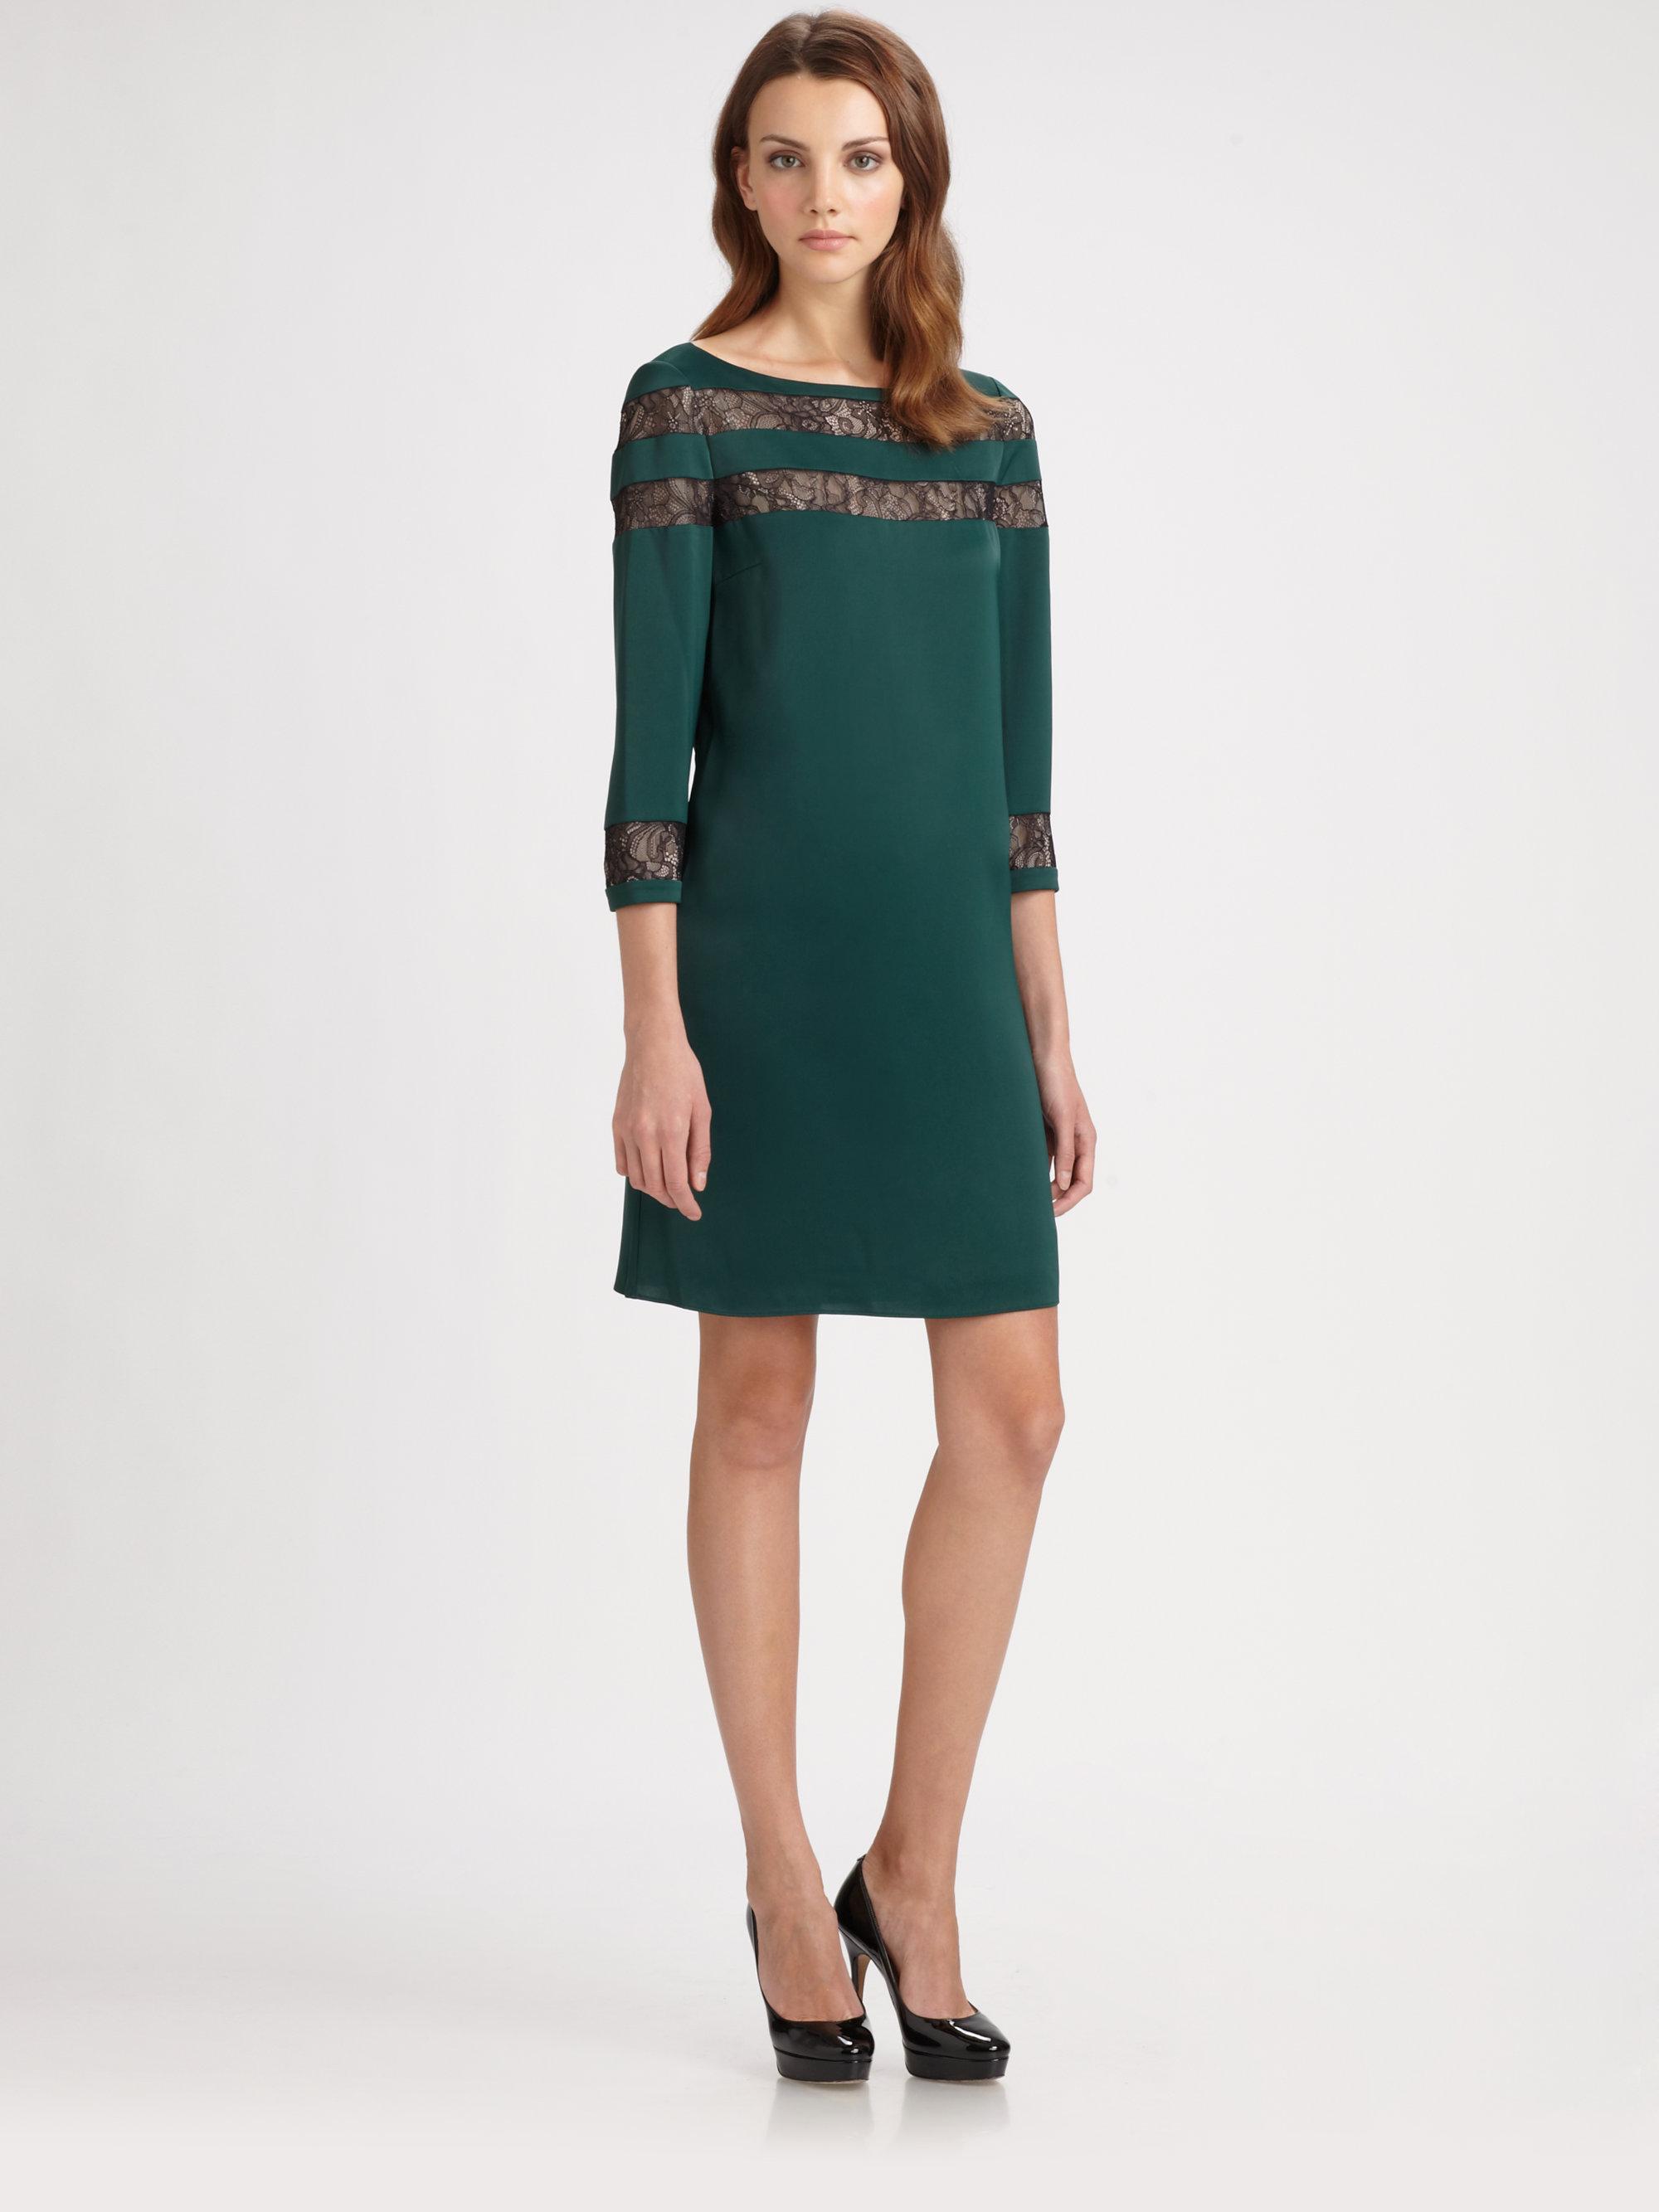 Erin Erin Fetherston Lace Inset Dress In Green Lyst